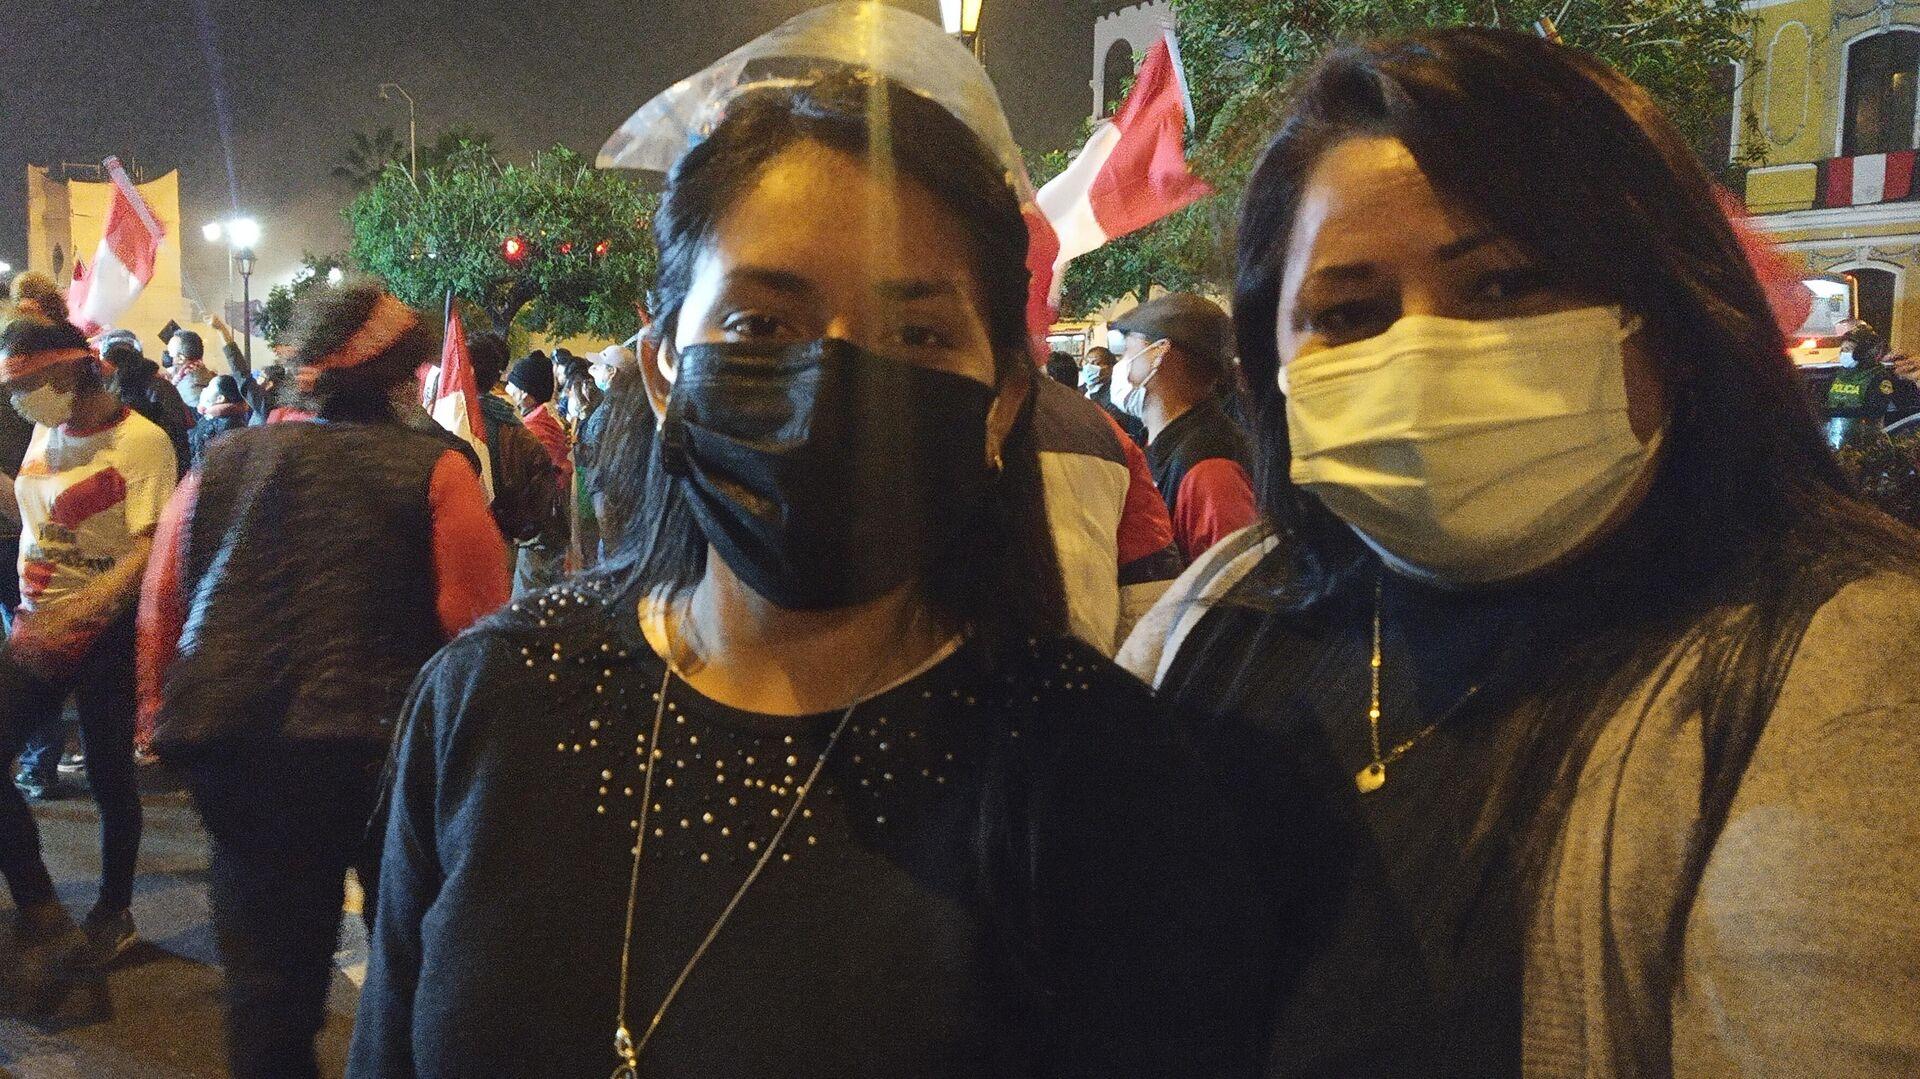 Kathy Justo, a la derecha, en apoyo a Keiko Fujimori - Sputnik Mundo, 1920, 17.06.2021